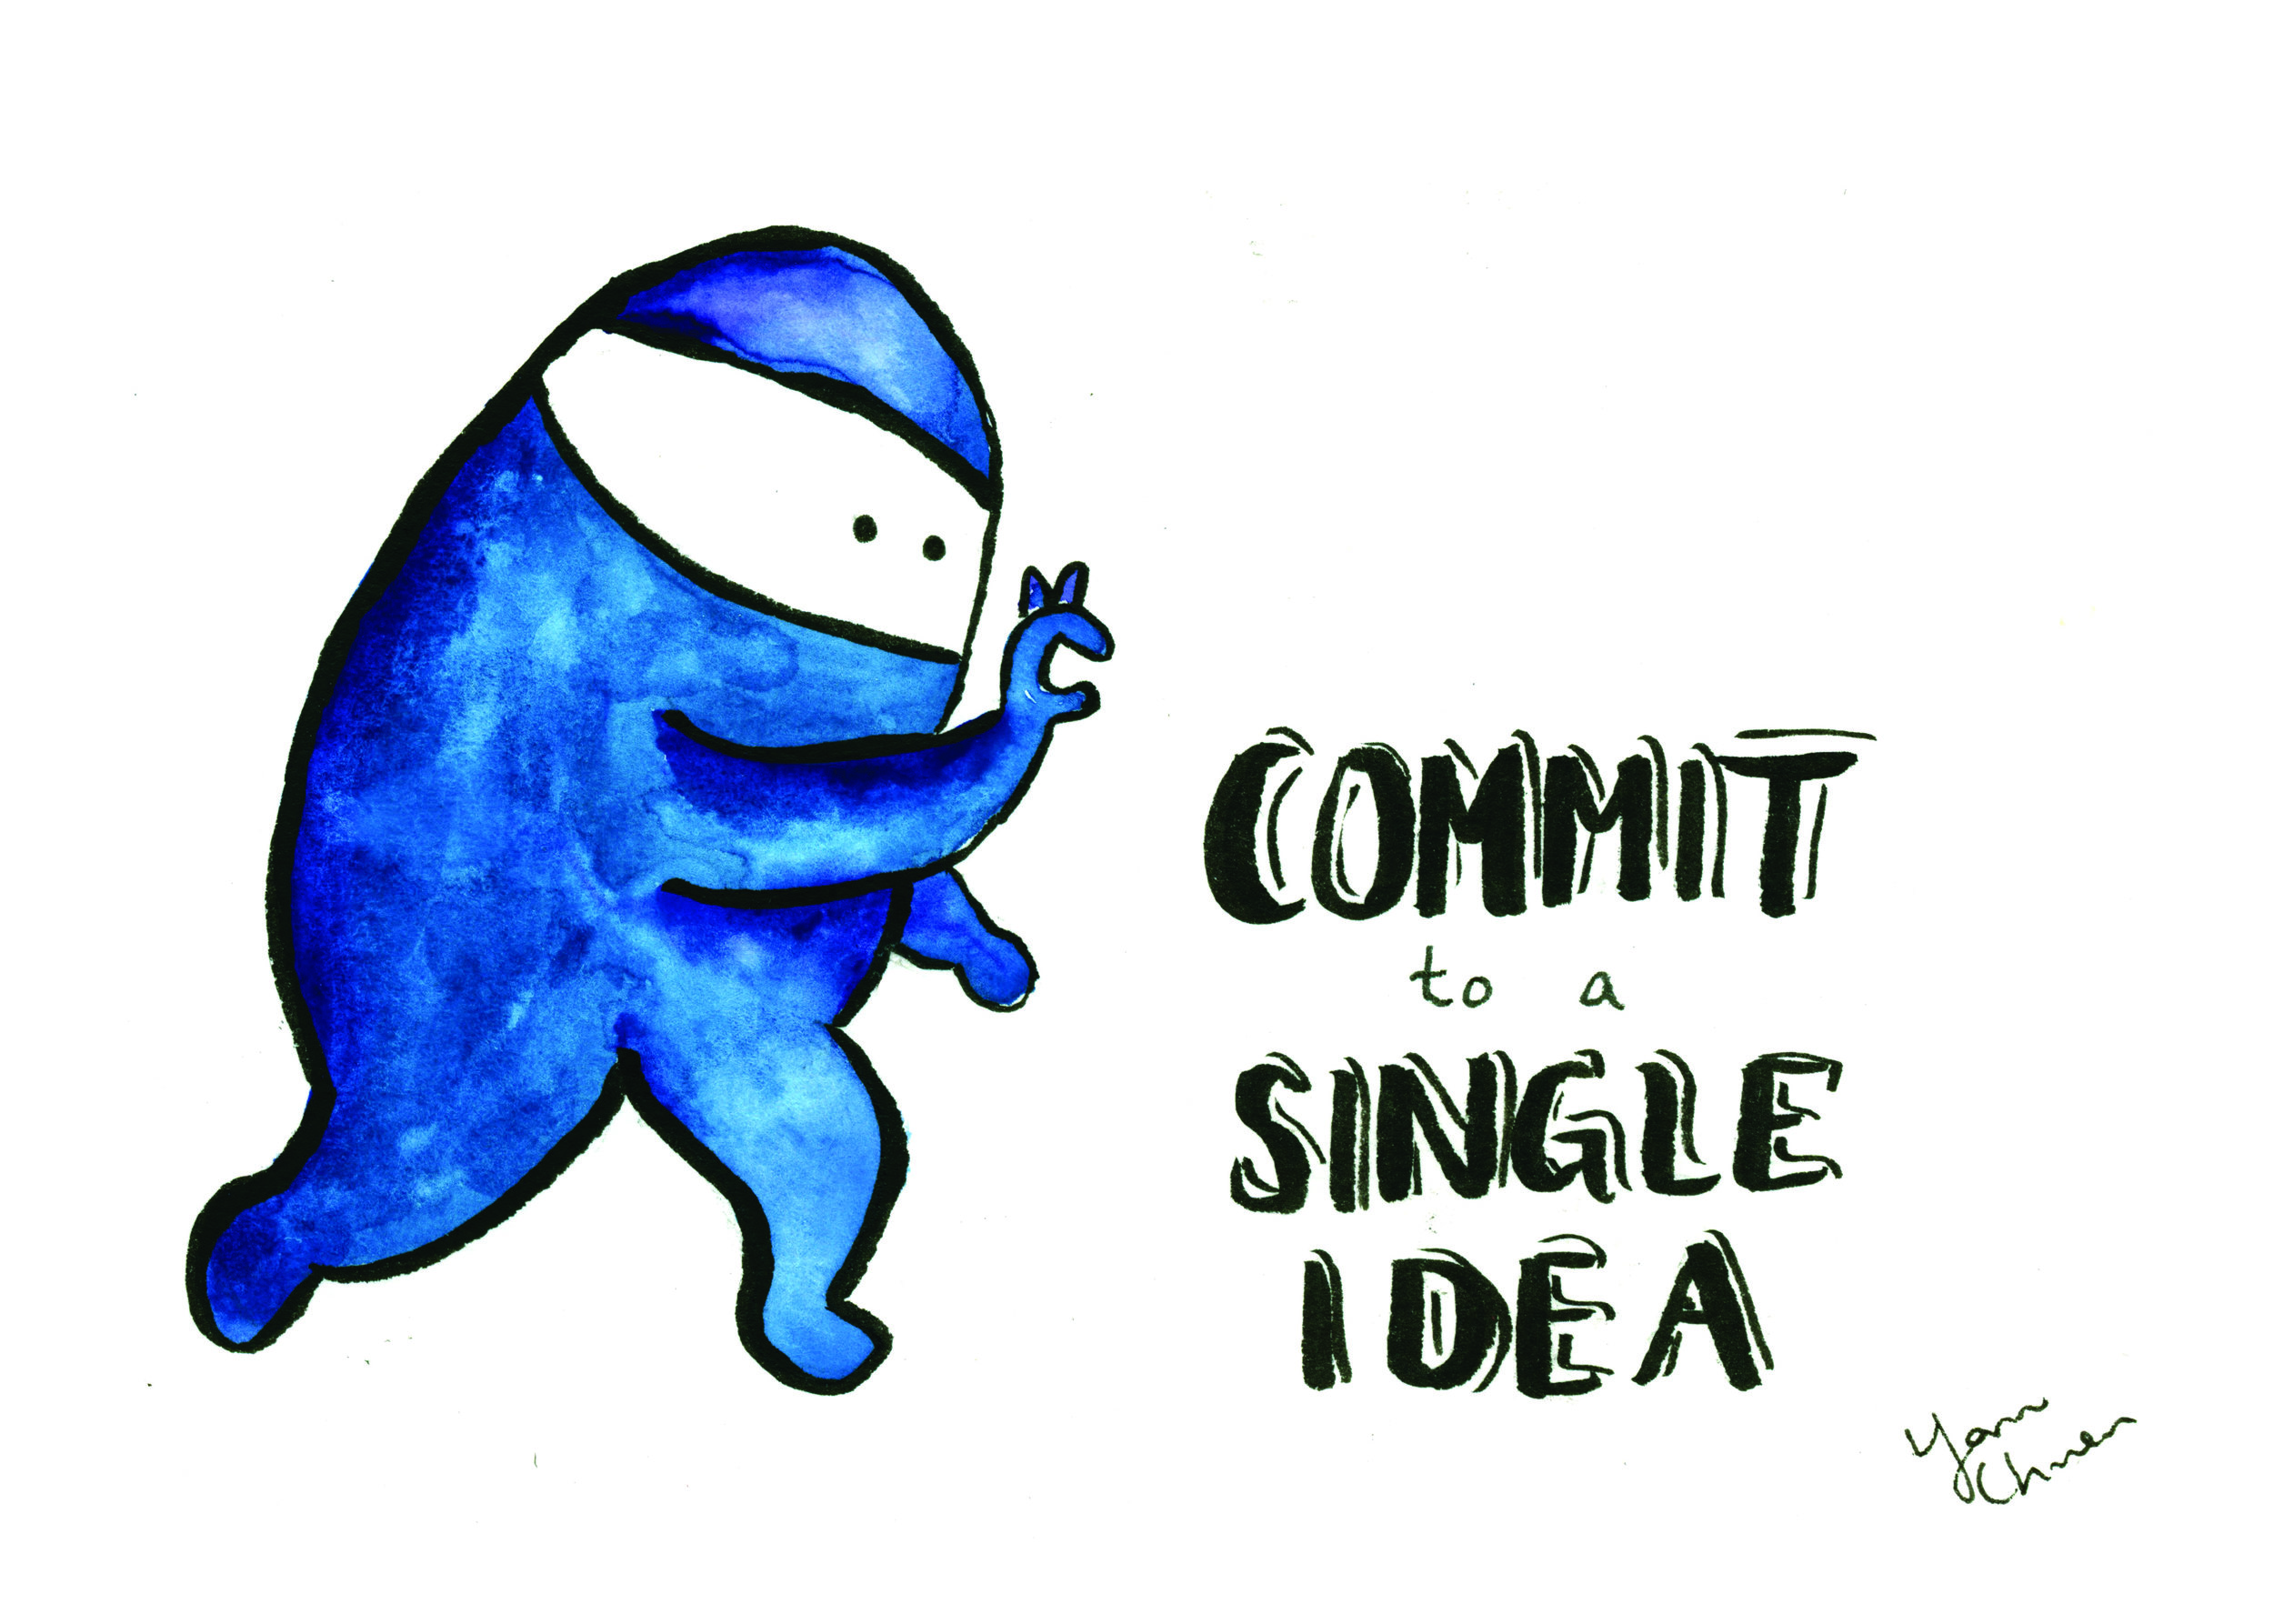 single idea.jpg